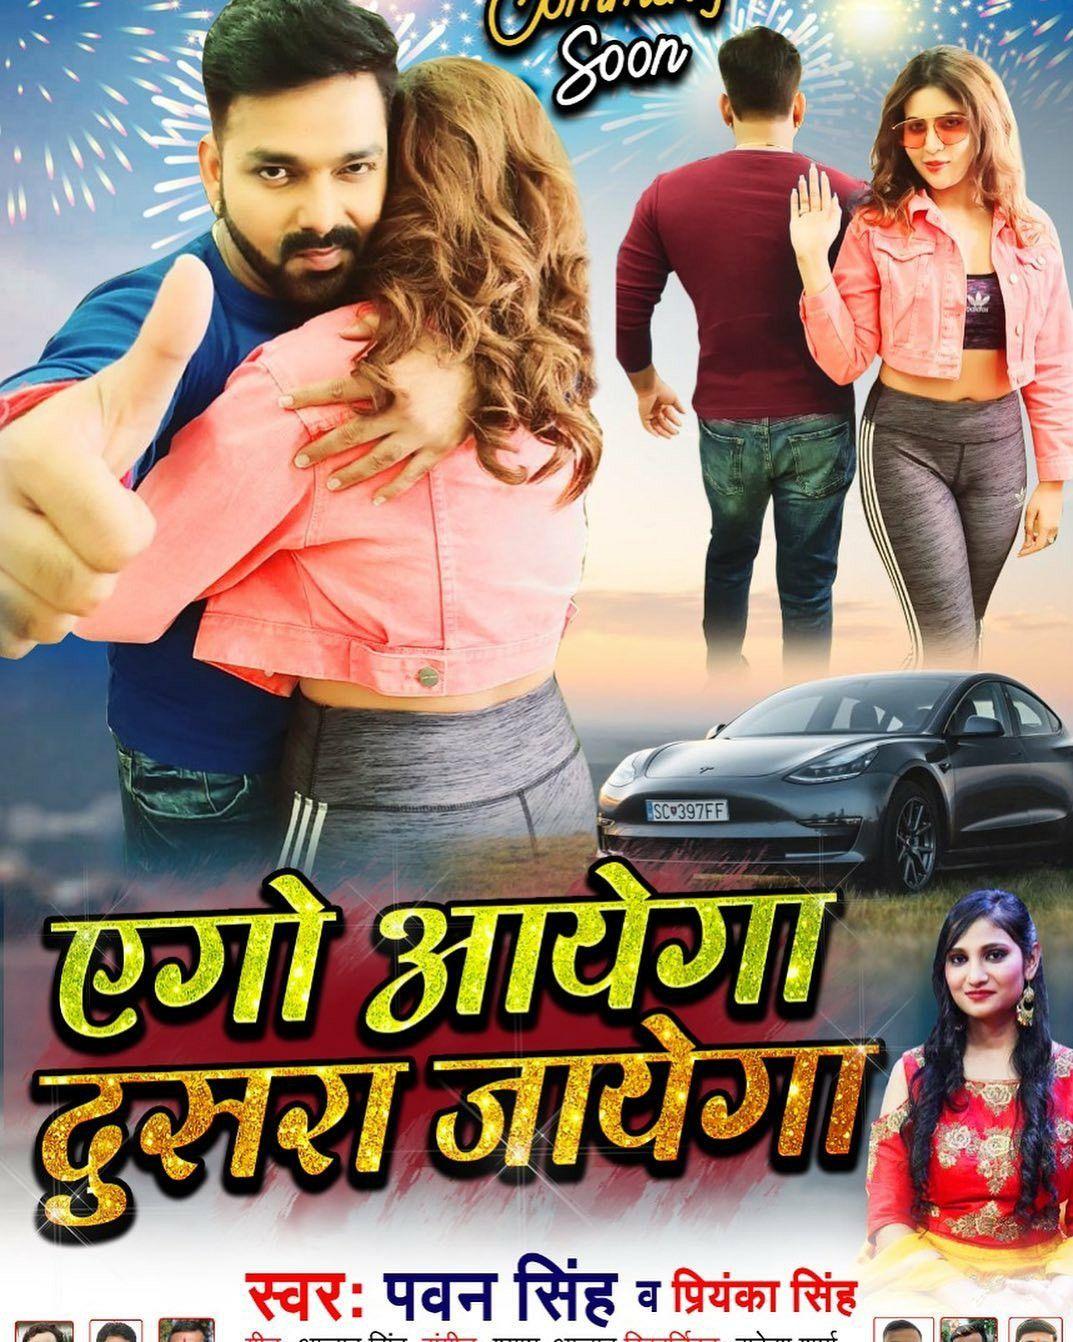 Ago Aayega Dusra Jayega Pawan Singh Happy New Year 2020 Song Download New Years Song Happy New Year Song Album Songs